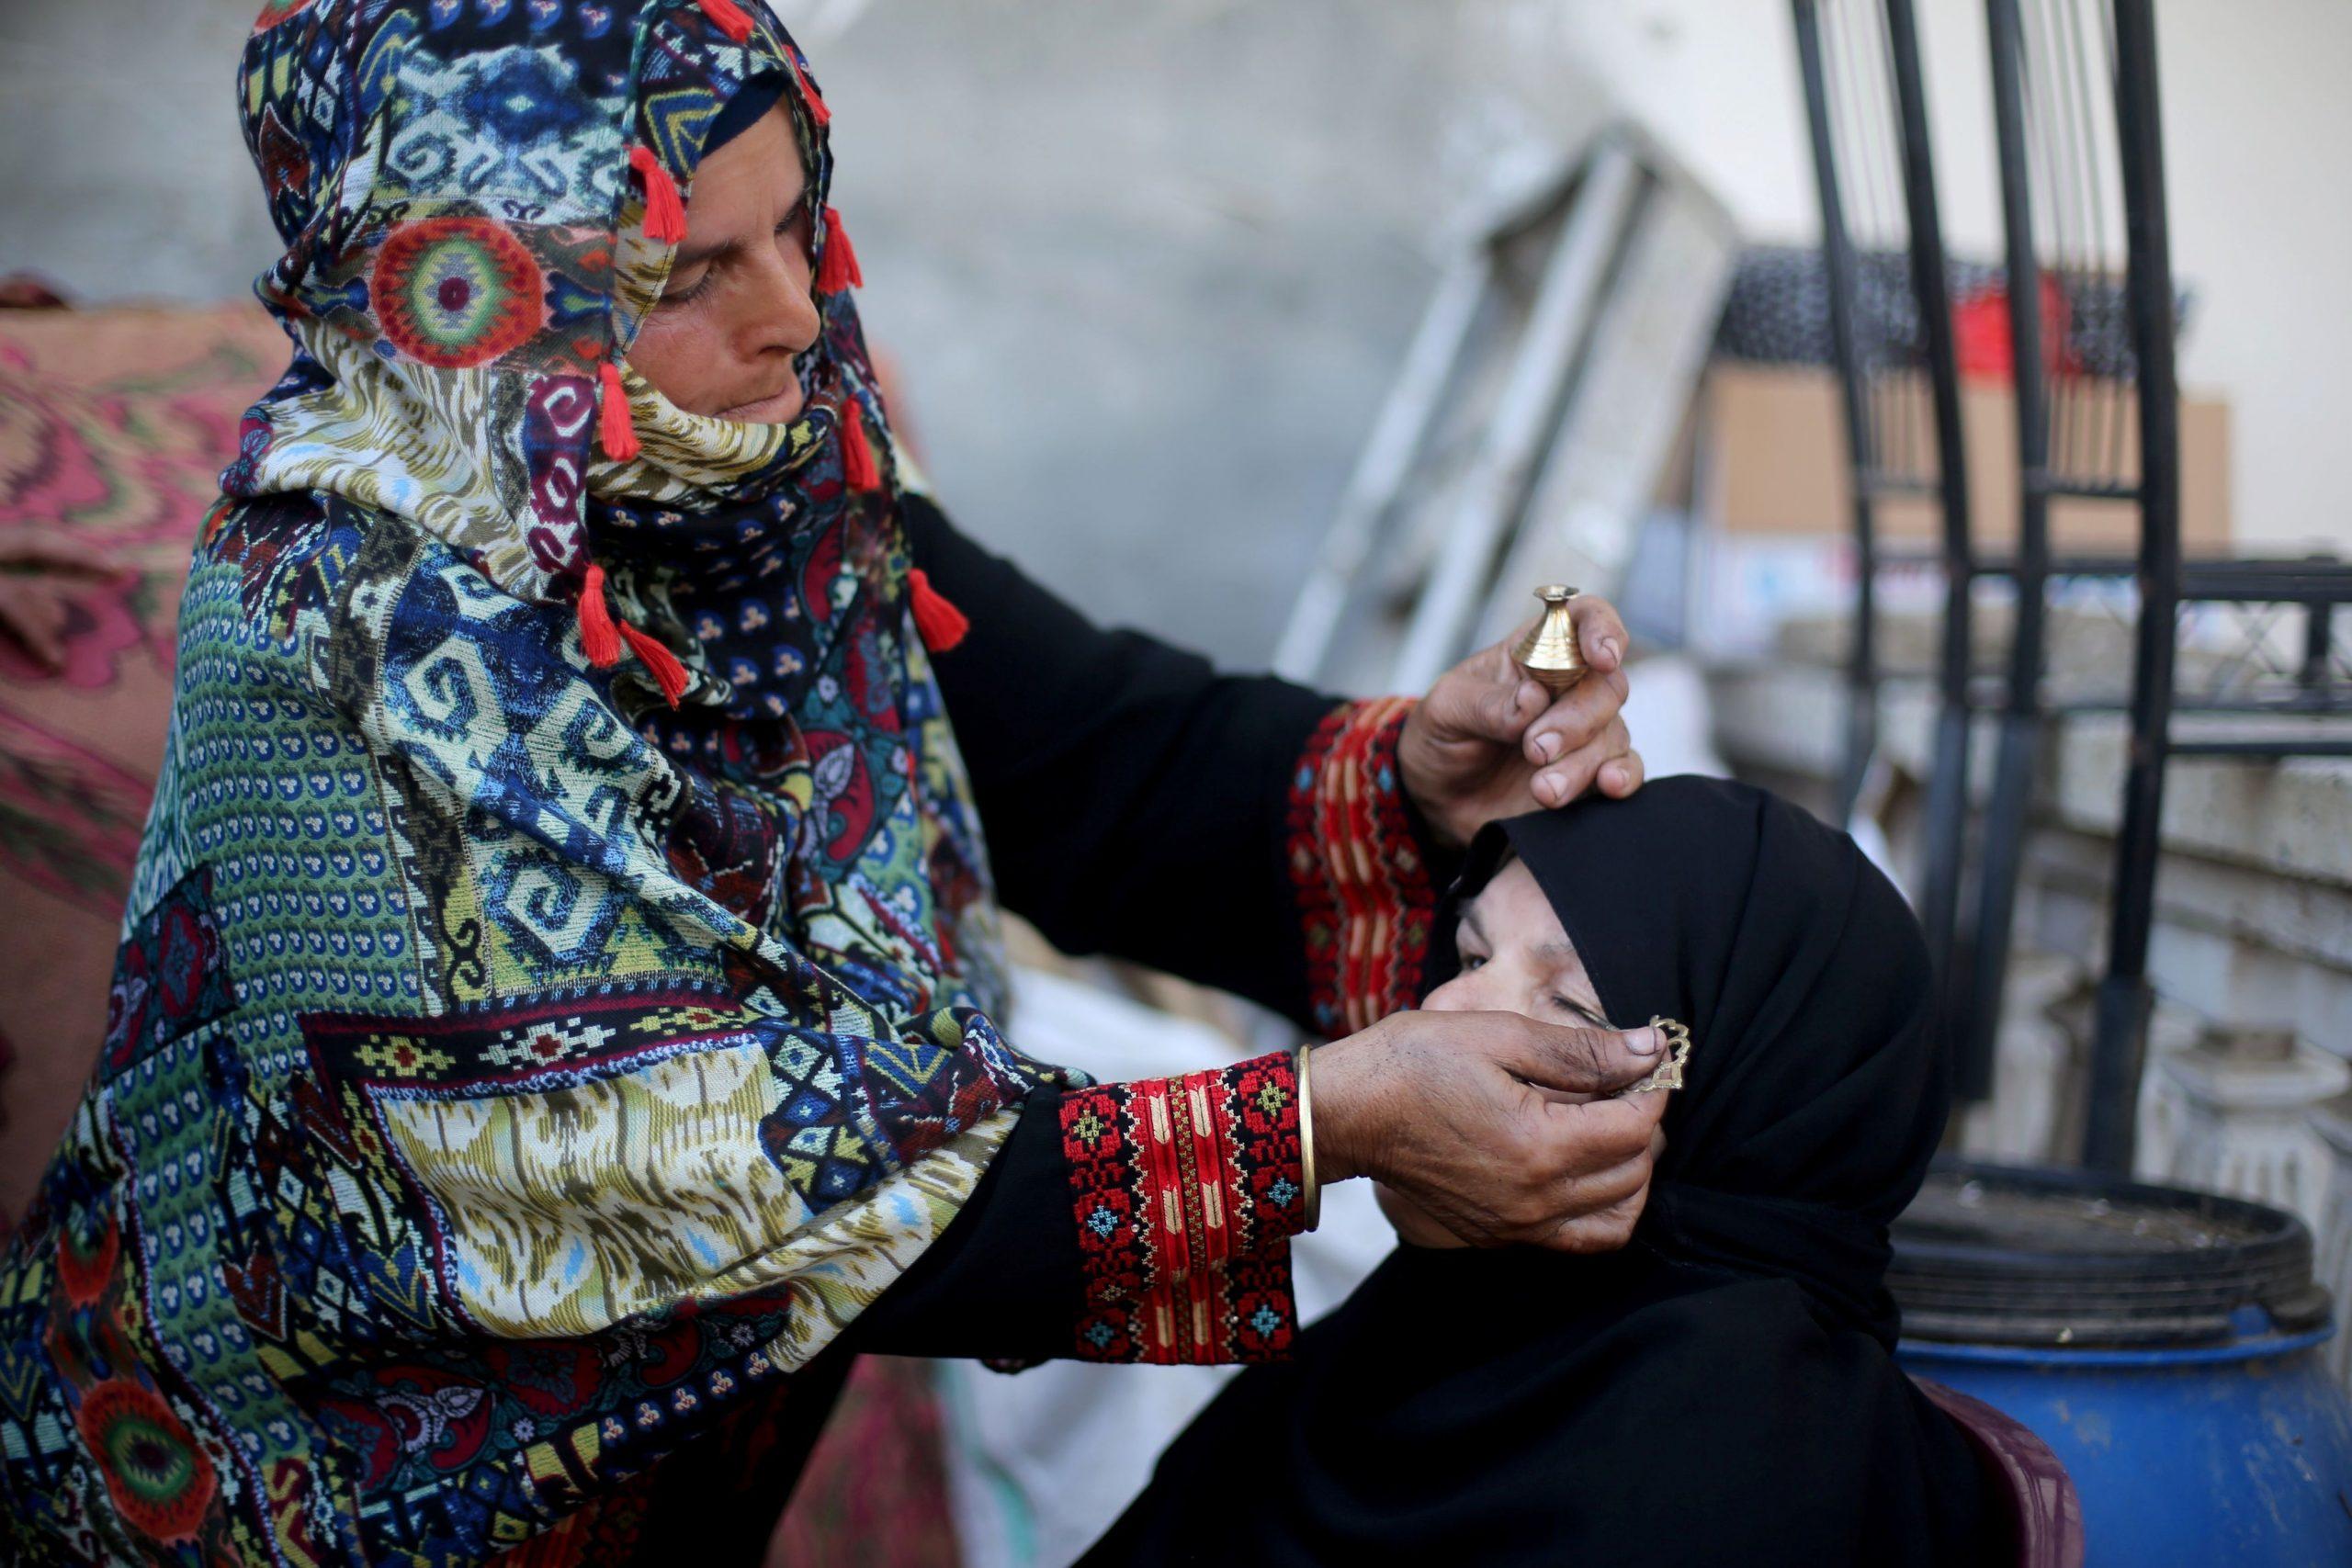 foto: REUTERS/Ibraheem Abu Mustafa